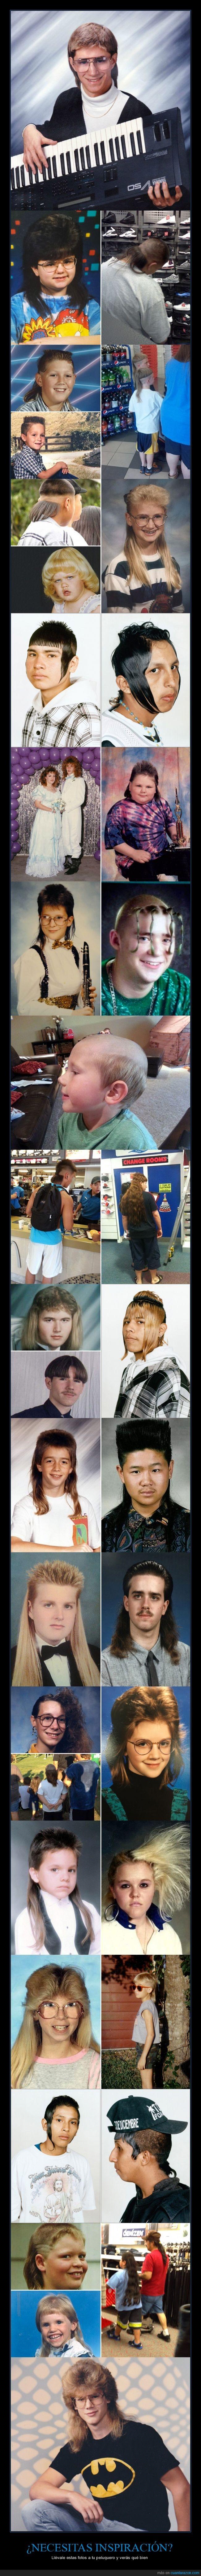 80's,90's,cateto,cola de rata,coletilla,cutre,mullet,peinado,pelo